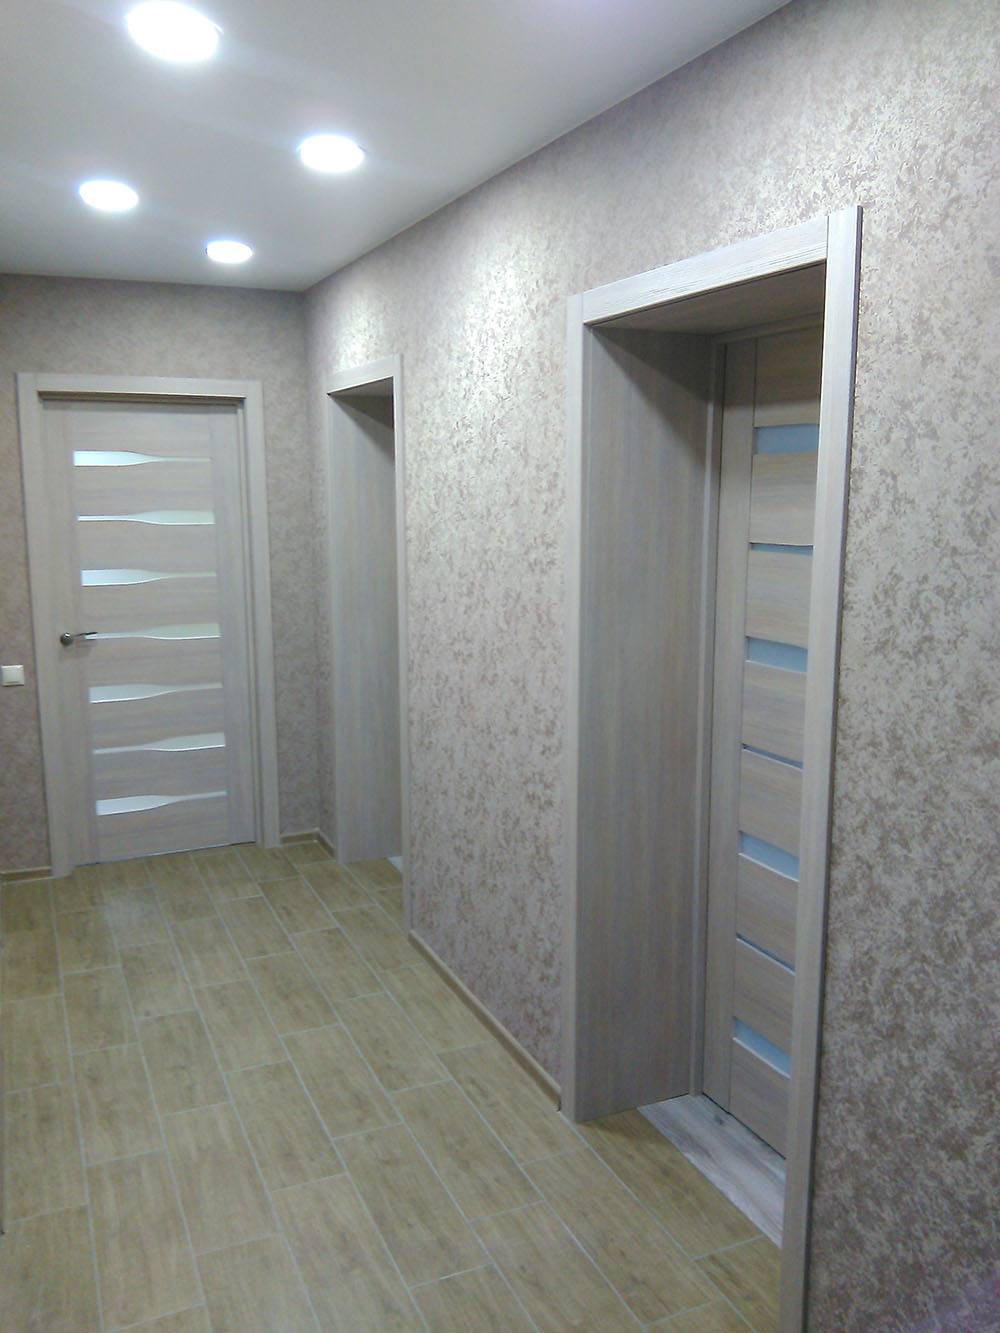 Ремонт квартиры в Владимире - цена за м2 с